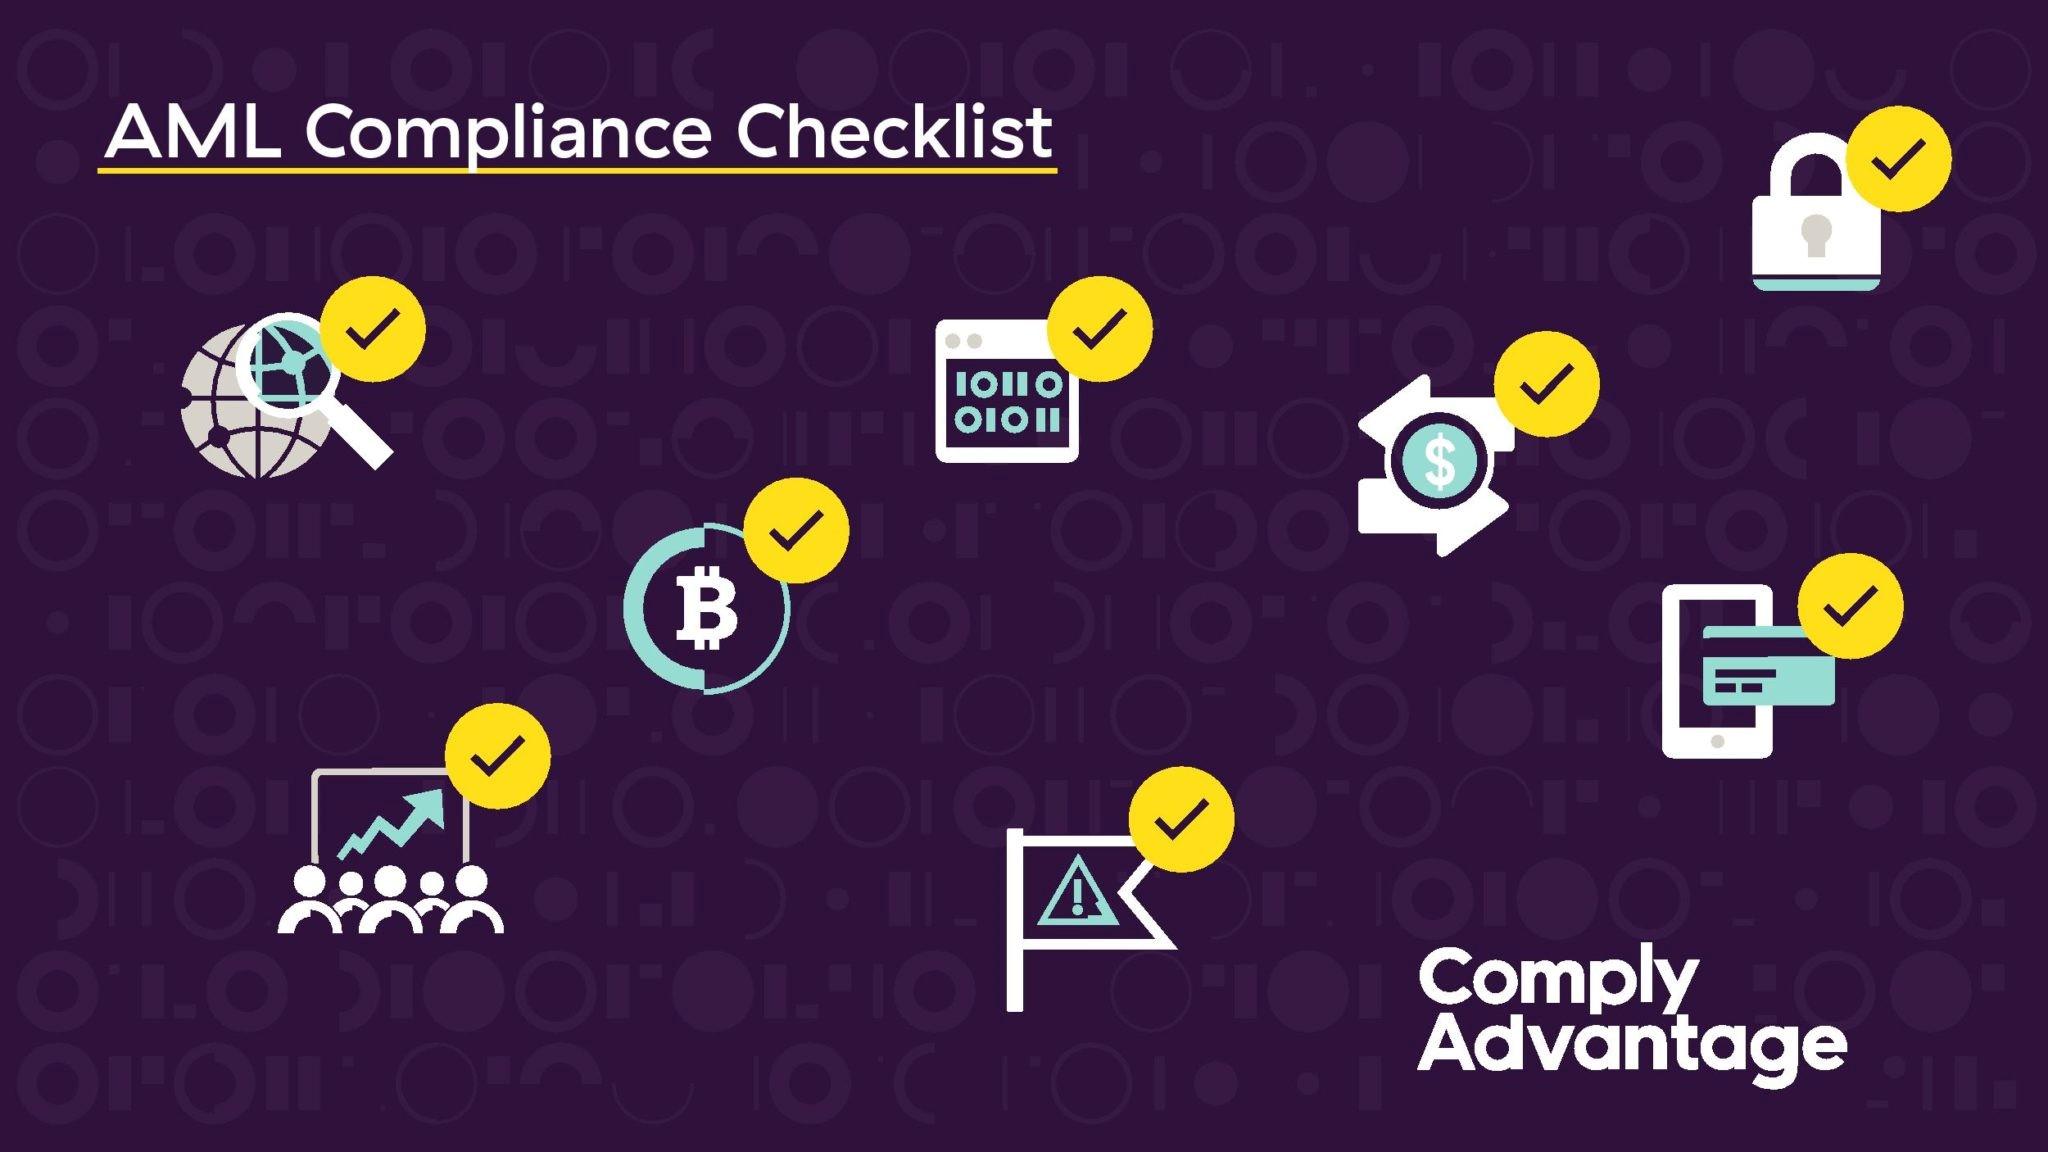 AML Compliance Checklist